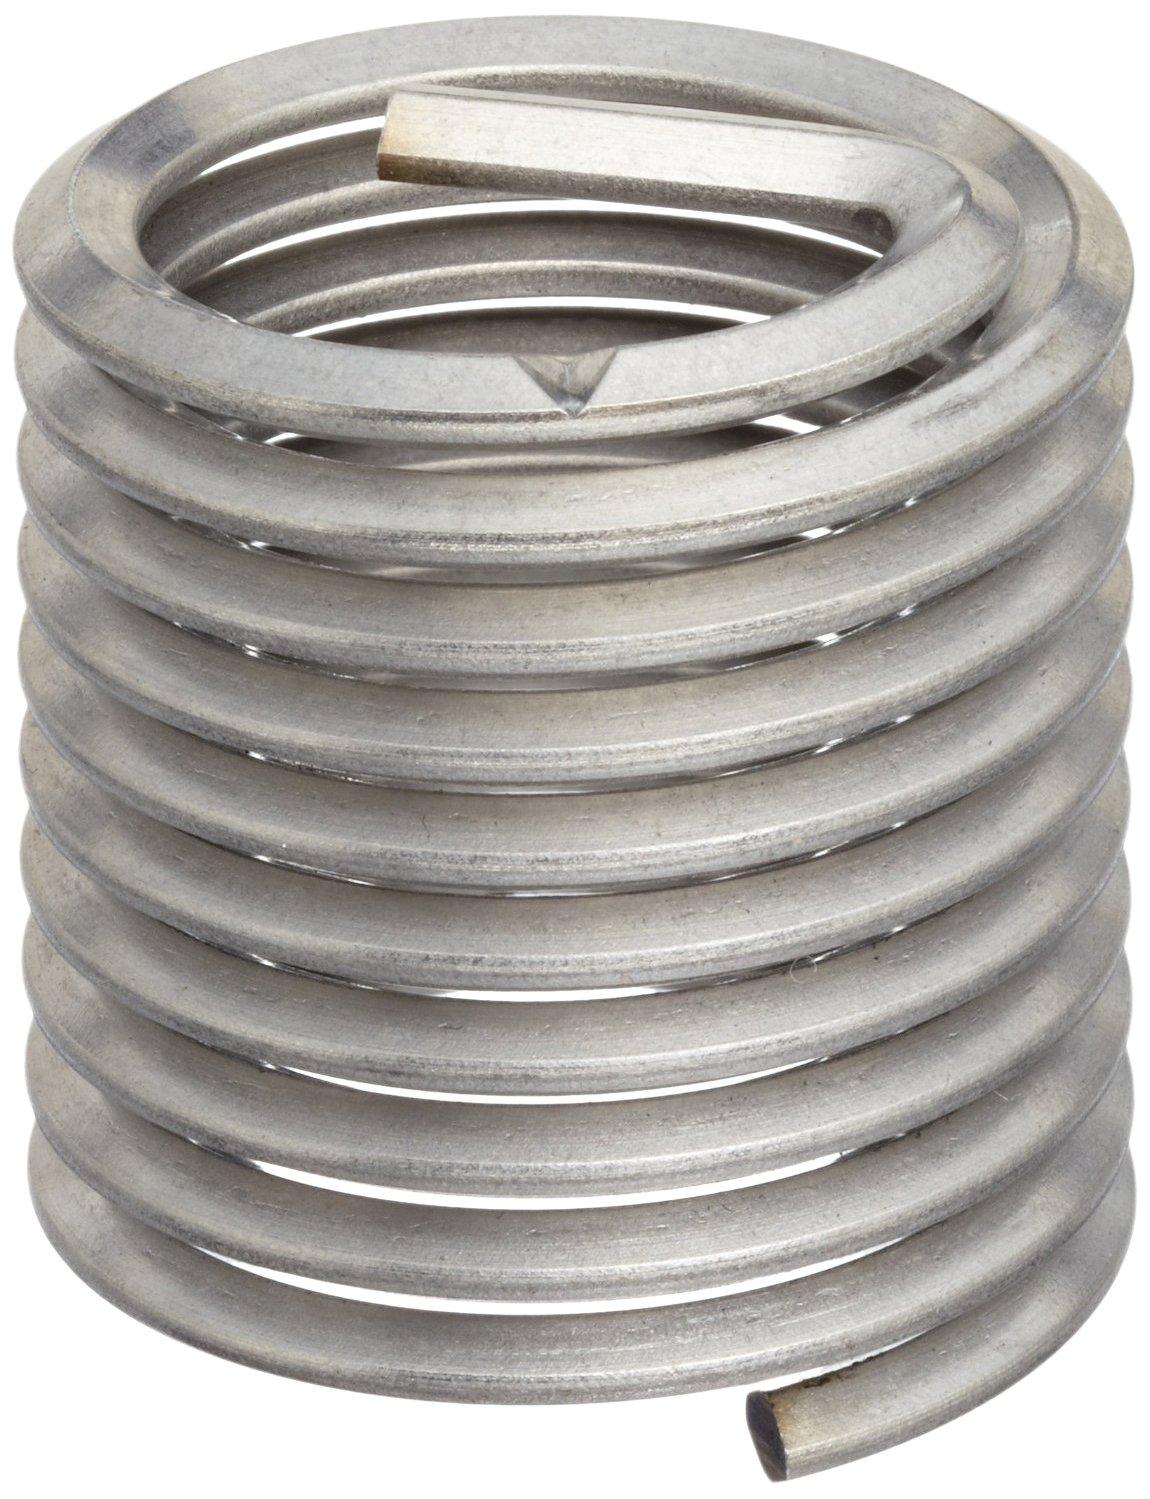 PowerCoil 3523-10.00X1.0DP M10 x 1.0 x 1.0D Wire Thread Inserts 10 Pack